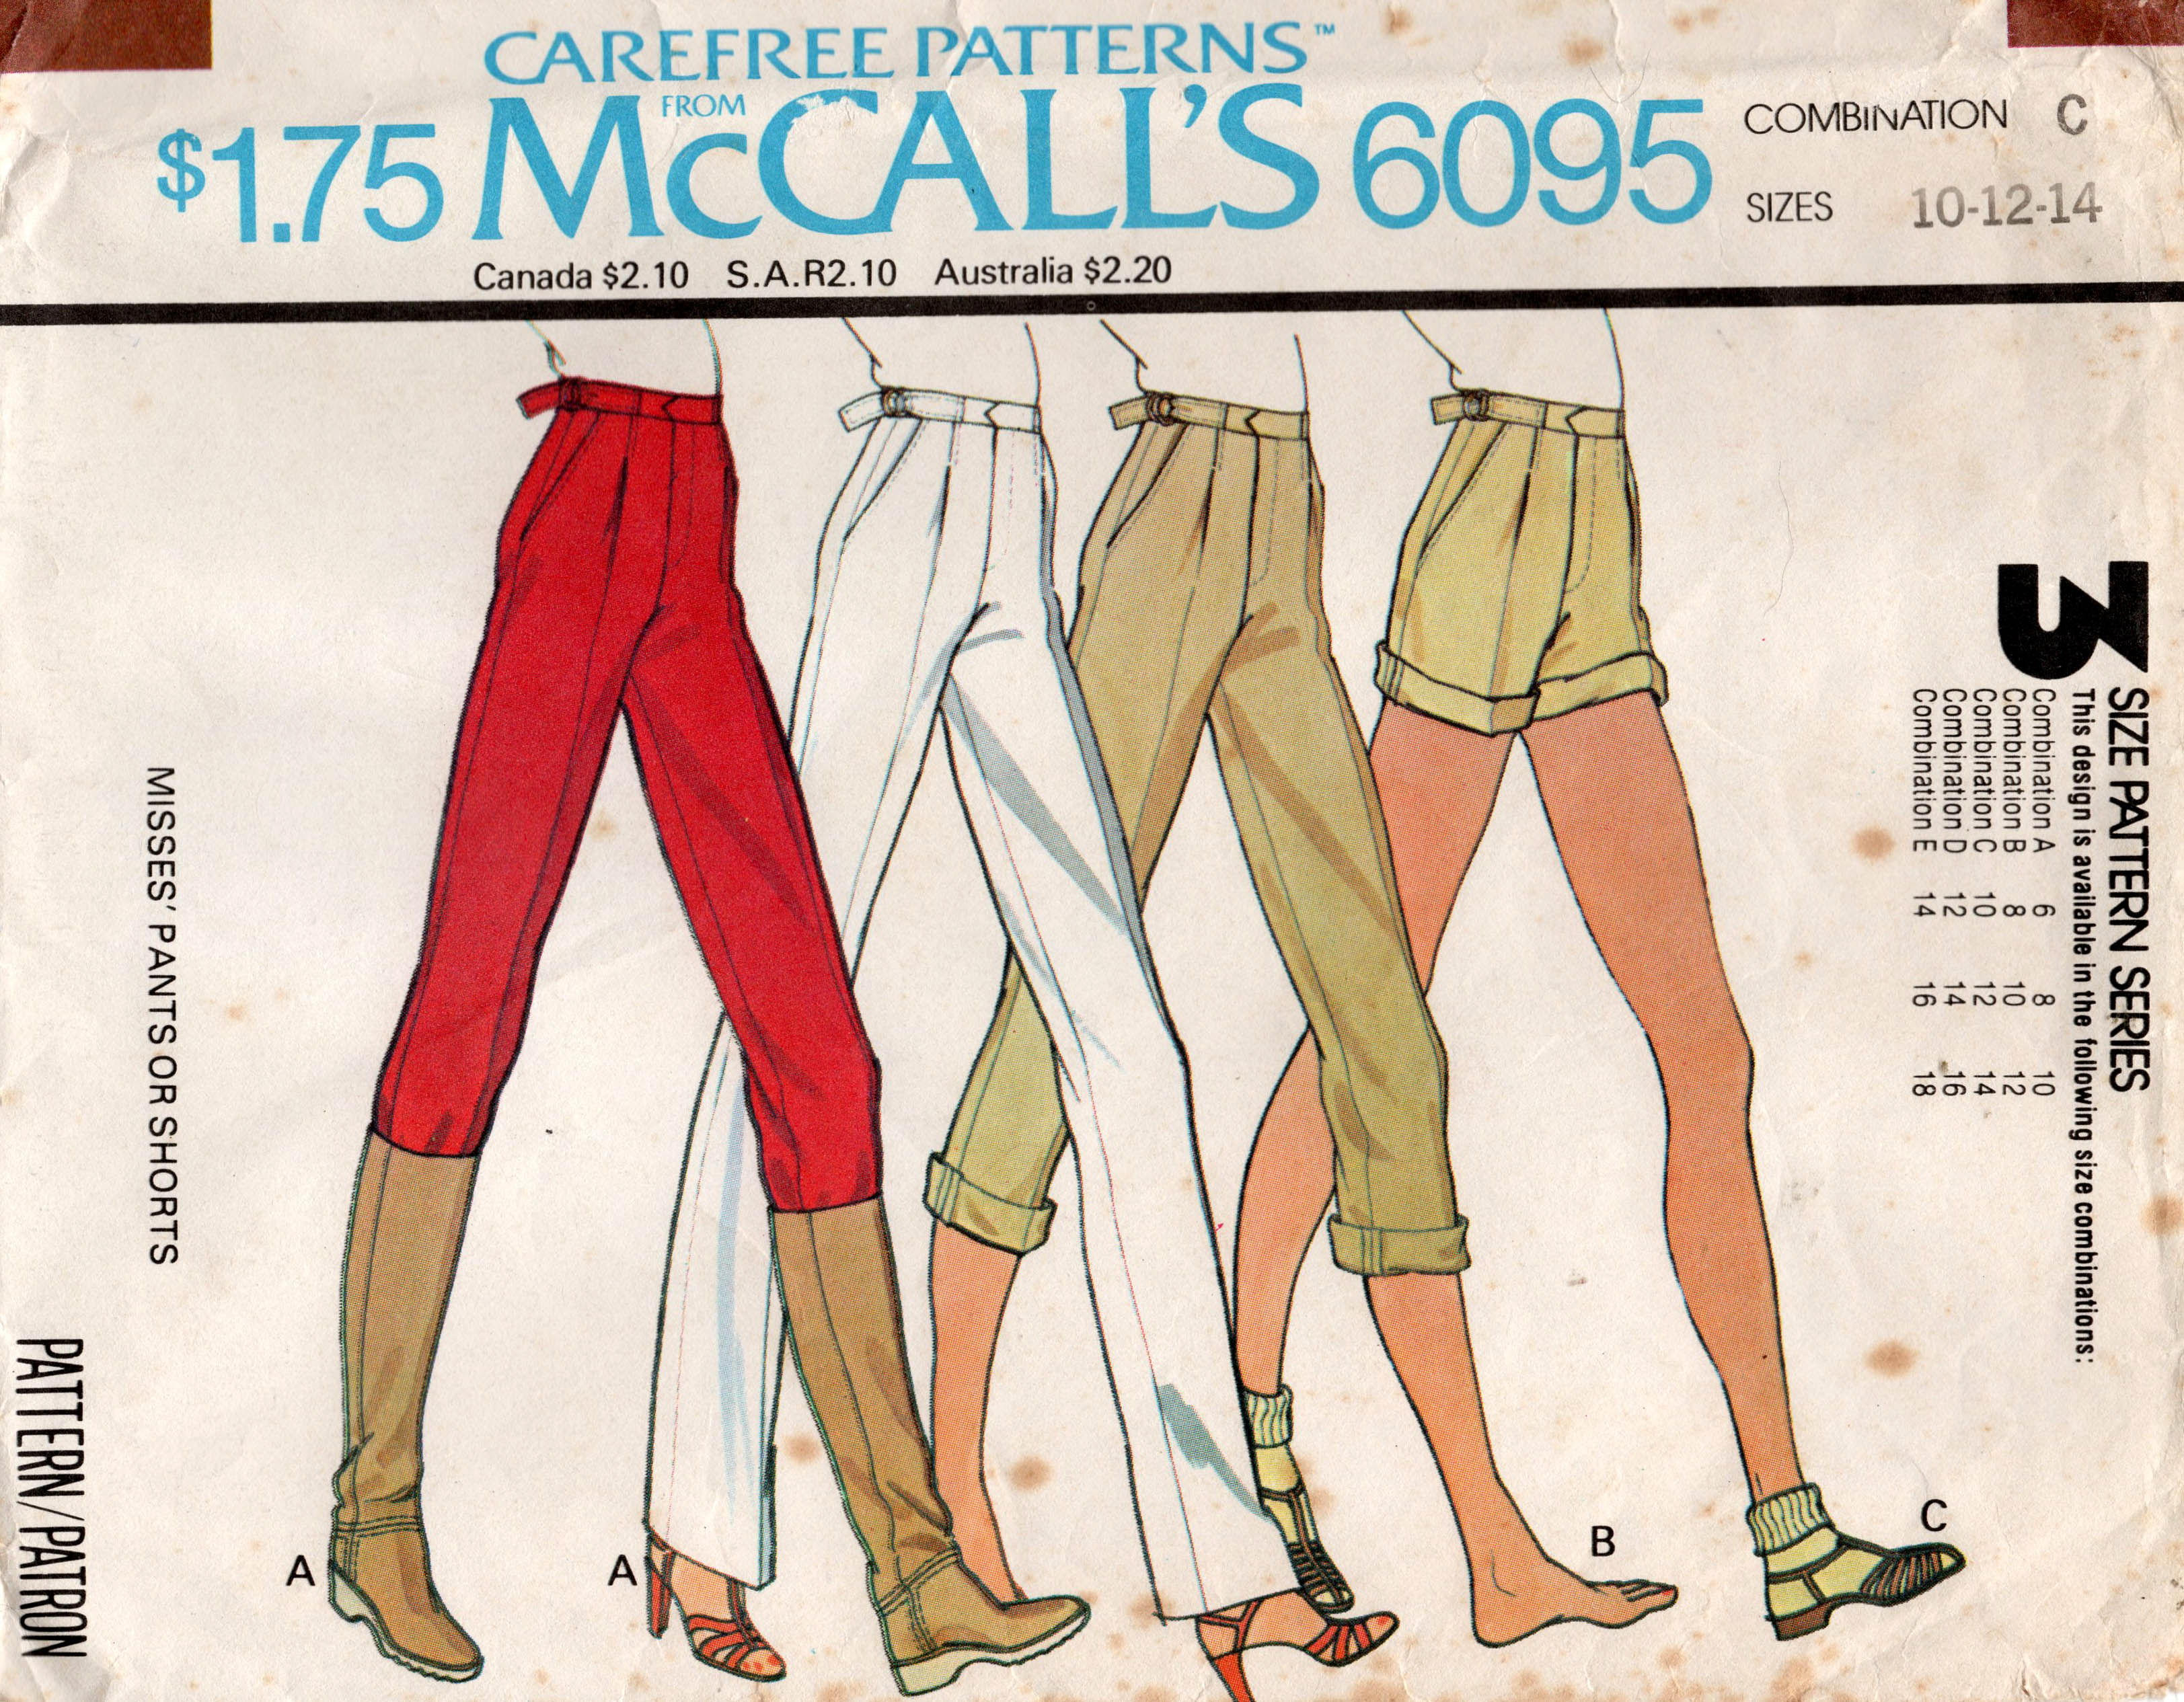 McCall's 6095 A